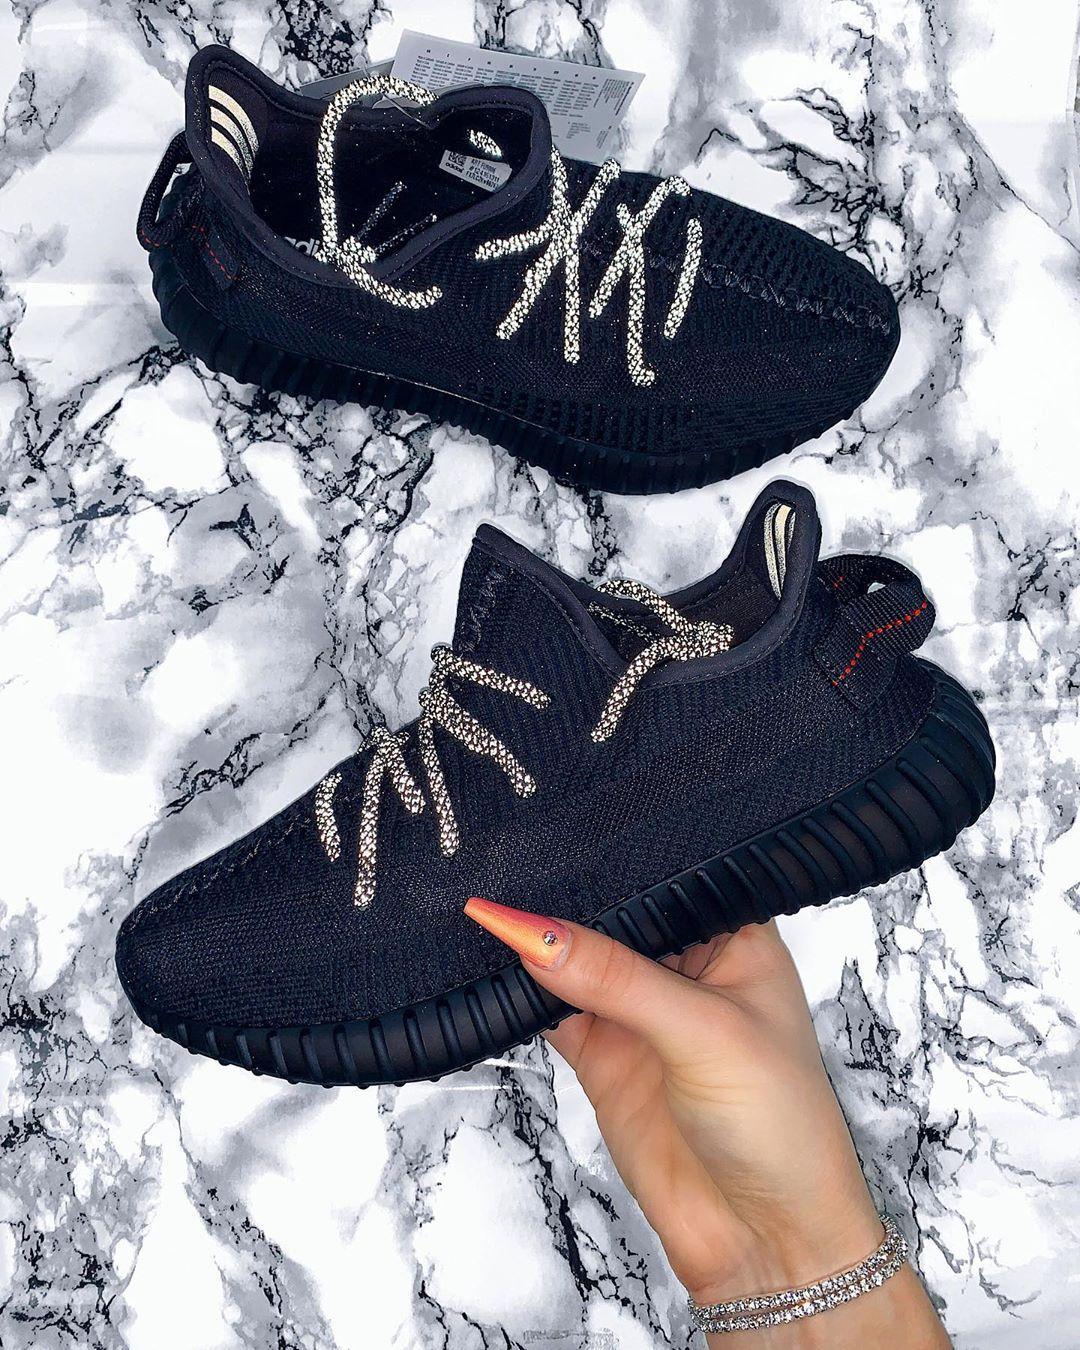 Yeezy Boost 350 V2 Black (Non-Reflective) en 2020   Kanye ...